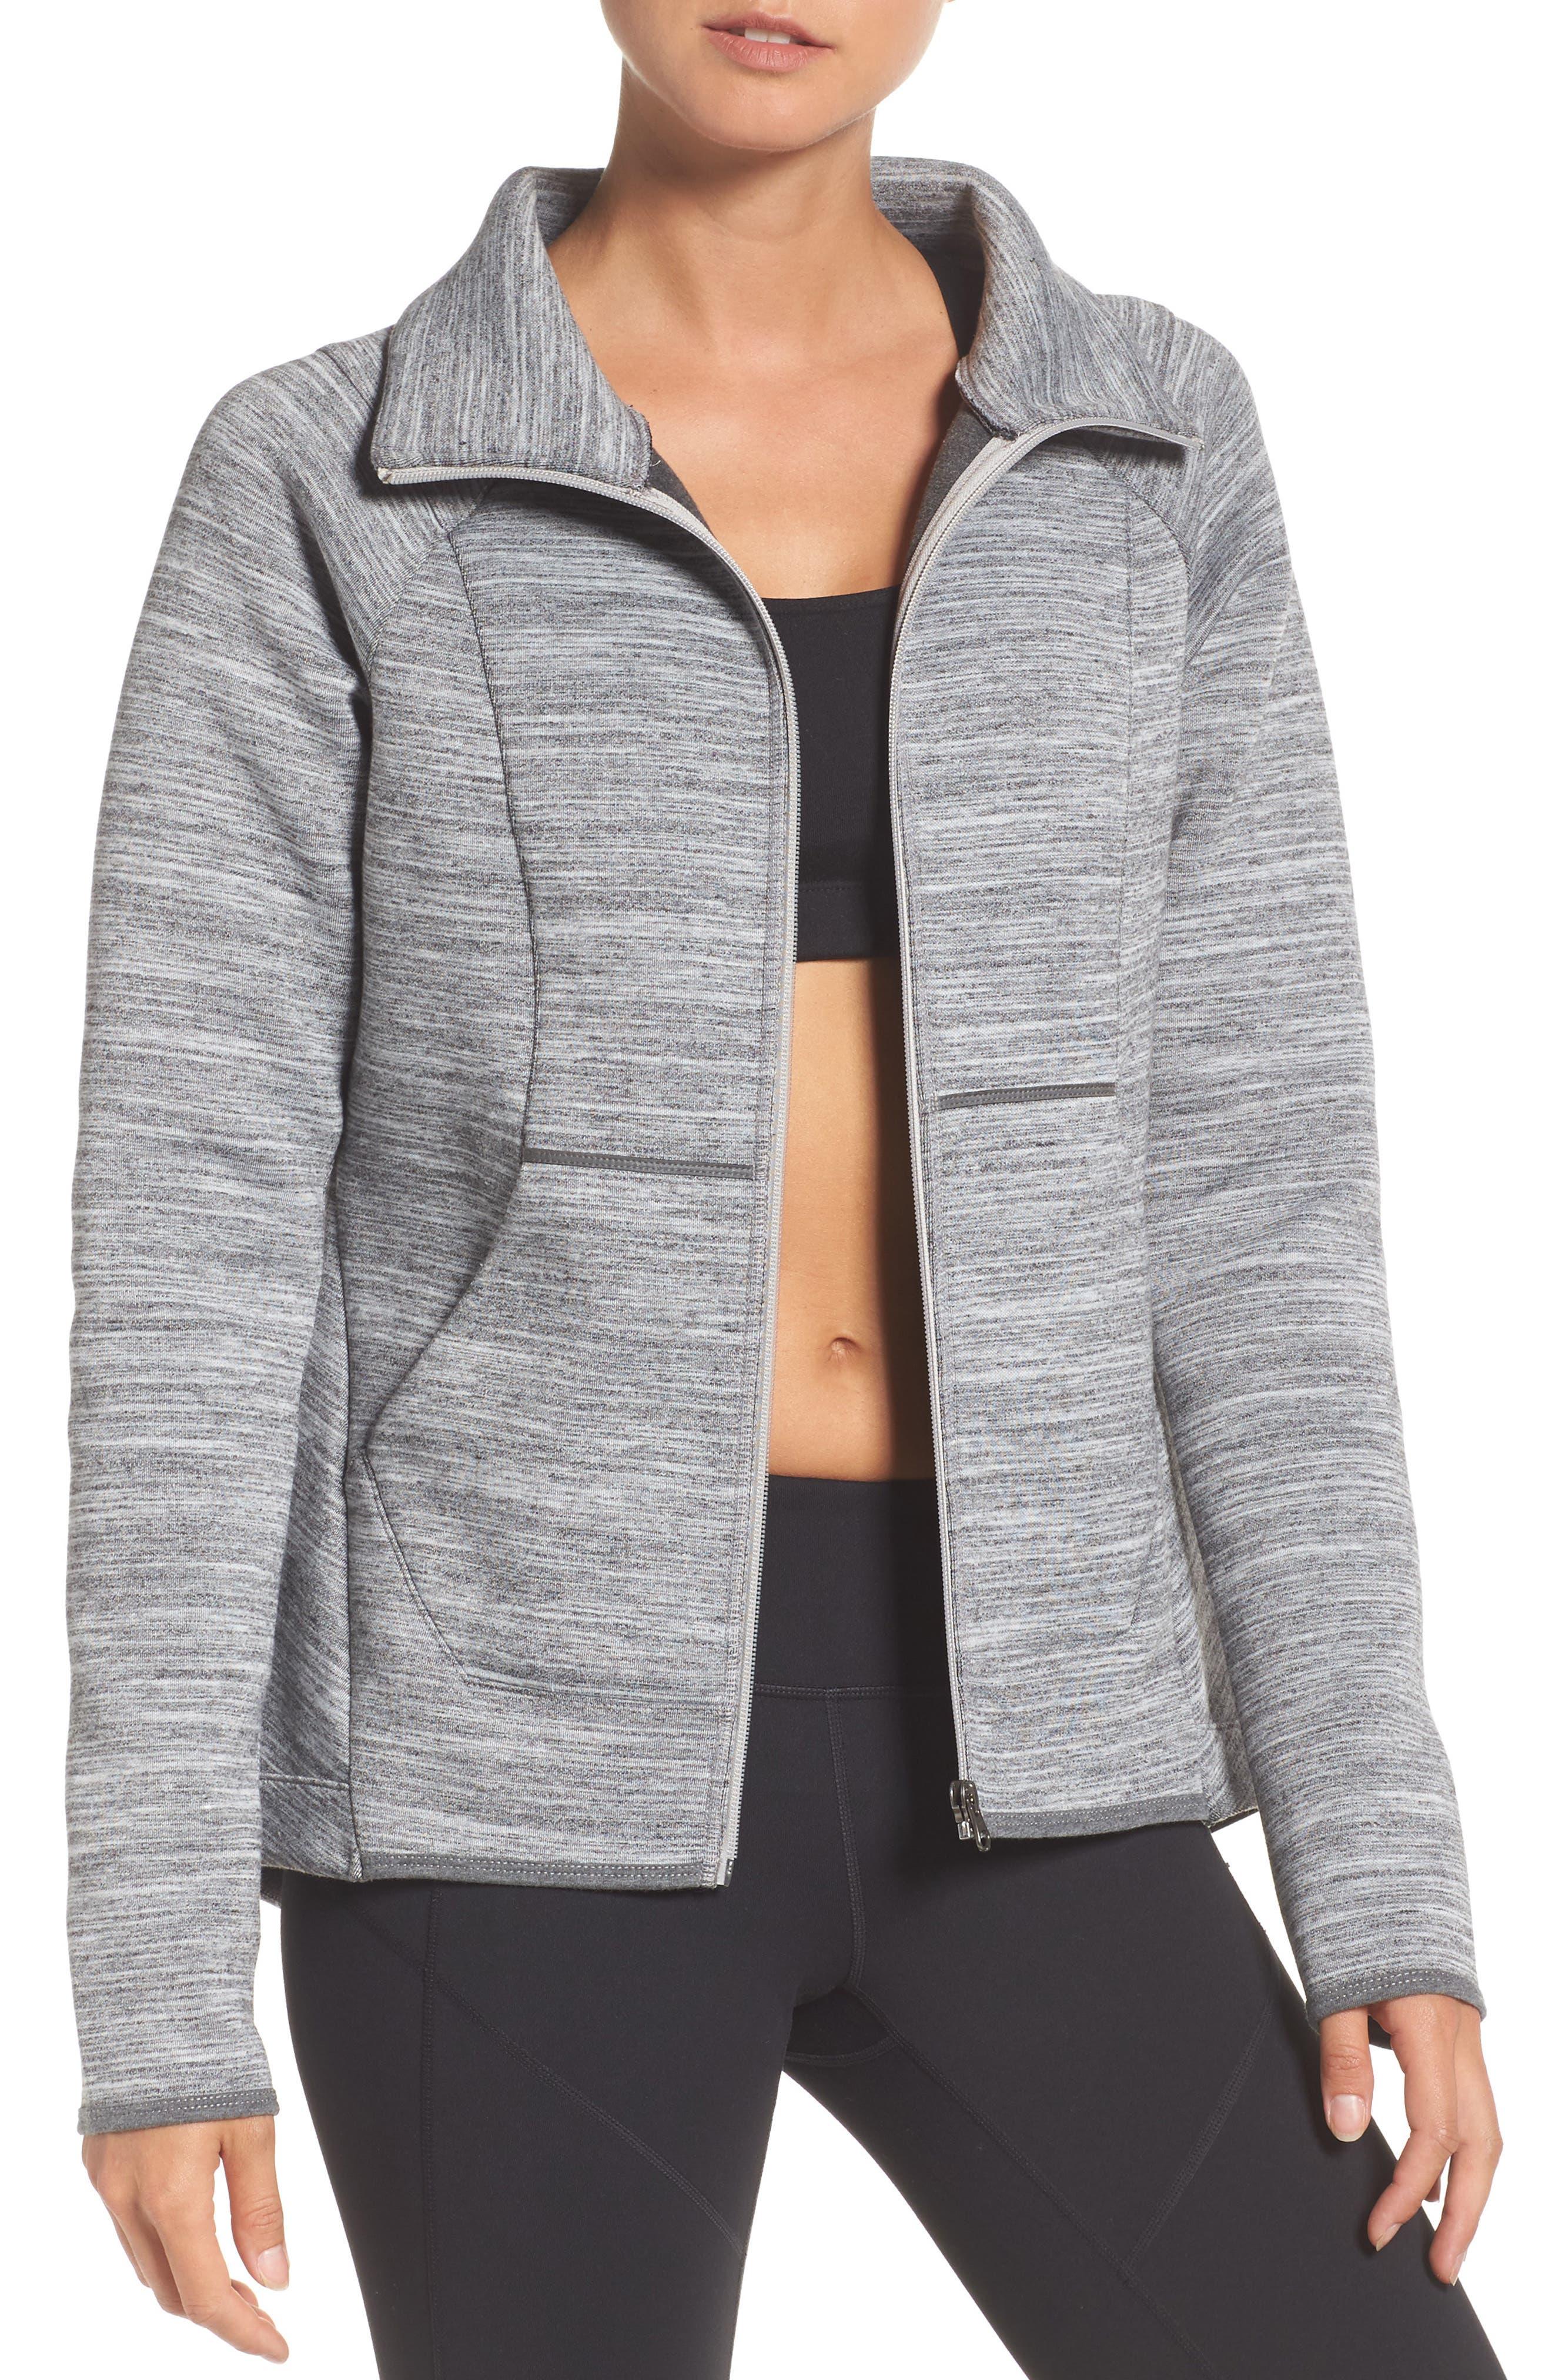 Interval Training Jacket,                         Main,                         color, Grey Medium Charcoal Heather